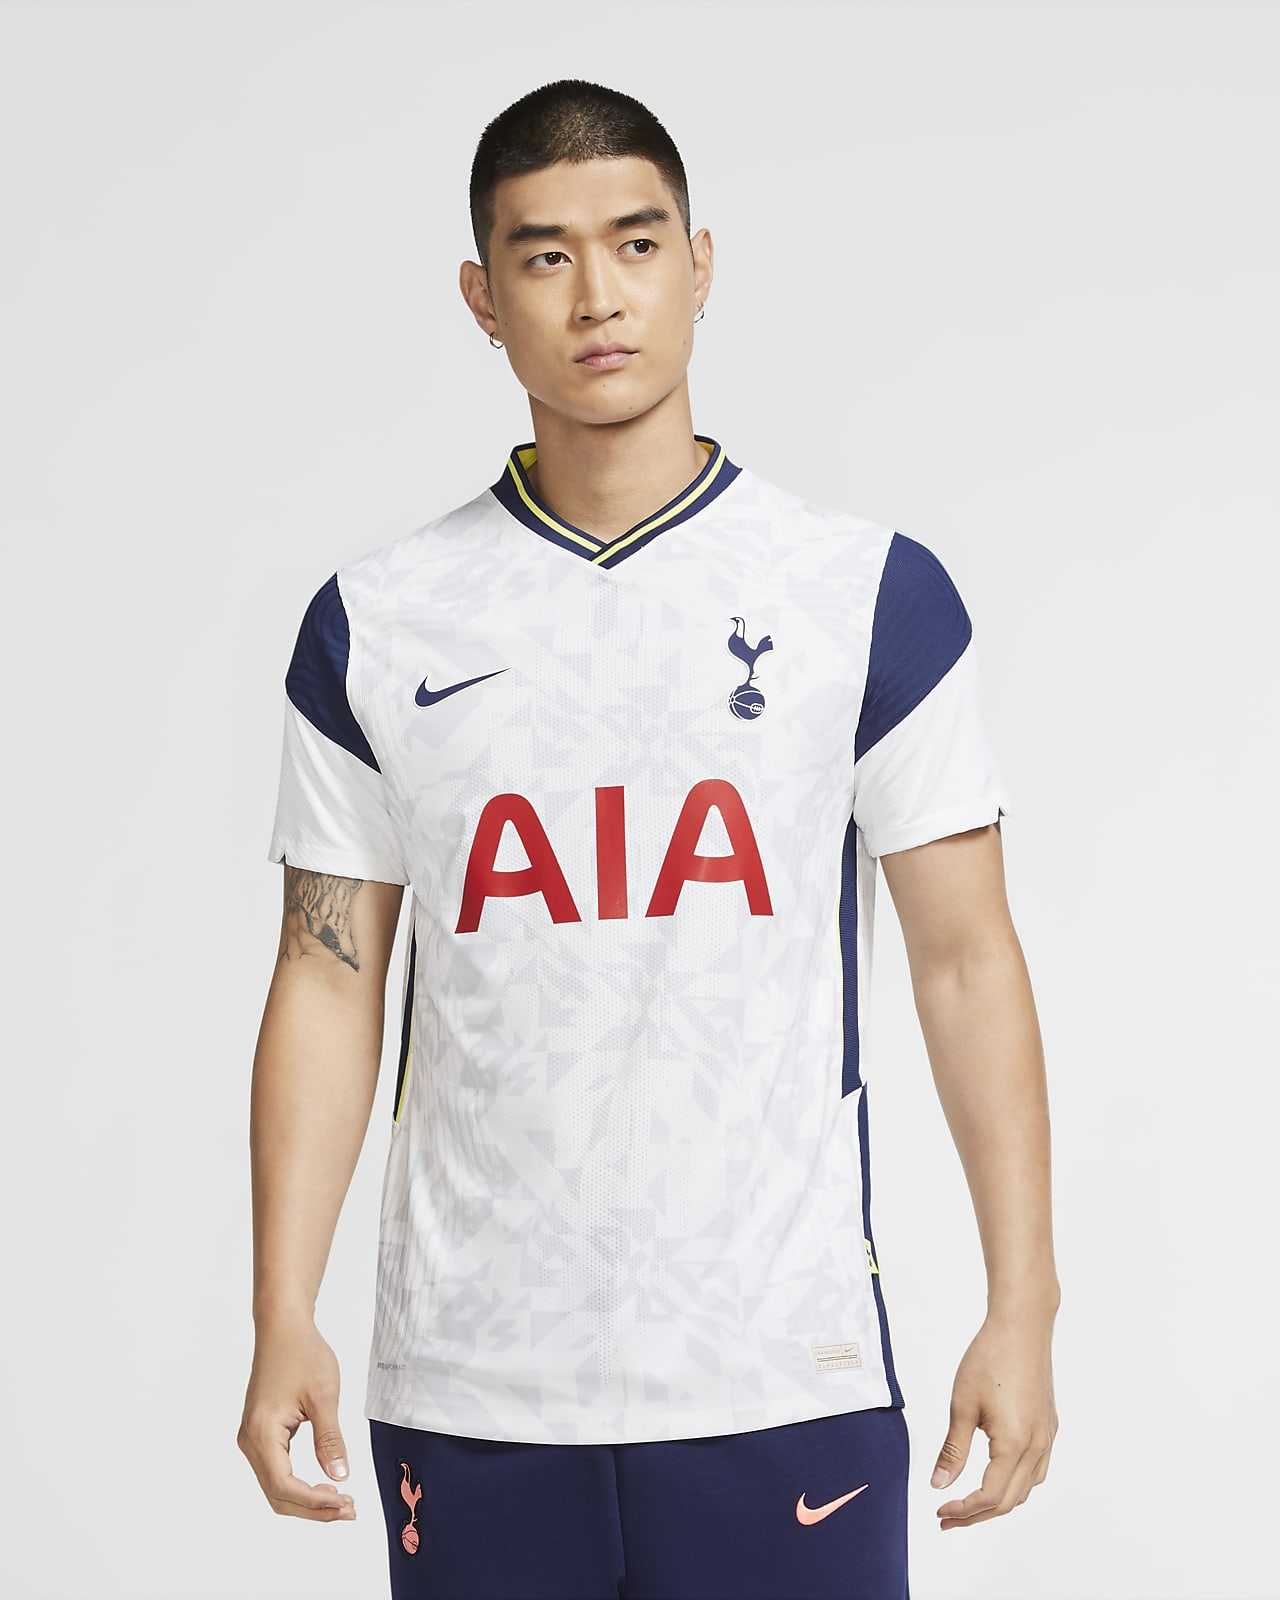 Tottenham Hotspur 2020/21 Vapor Match Home Herren-Fußballtrikot